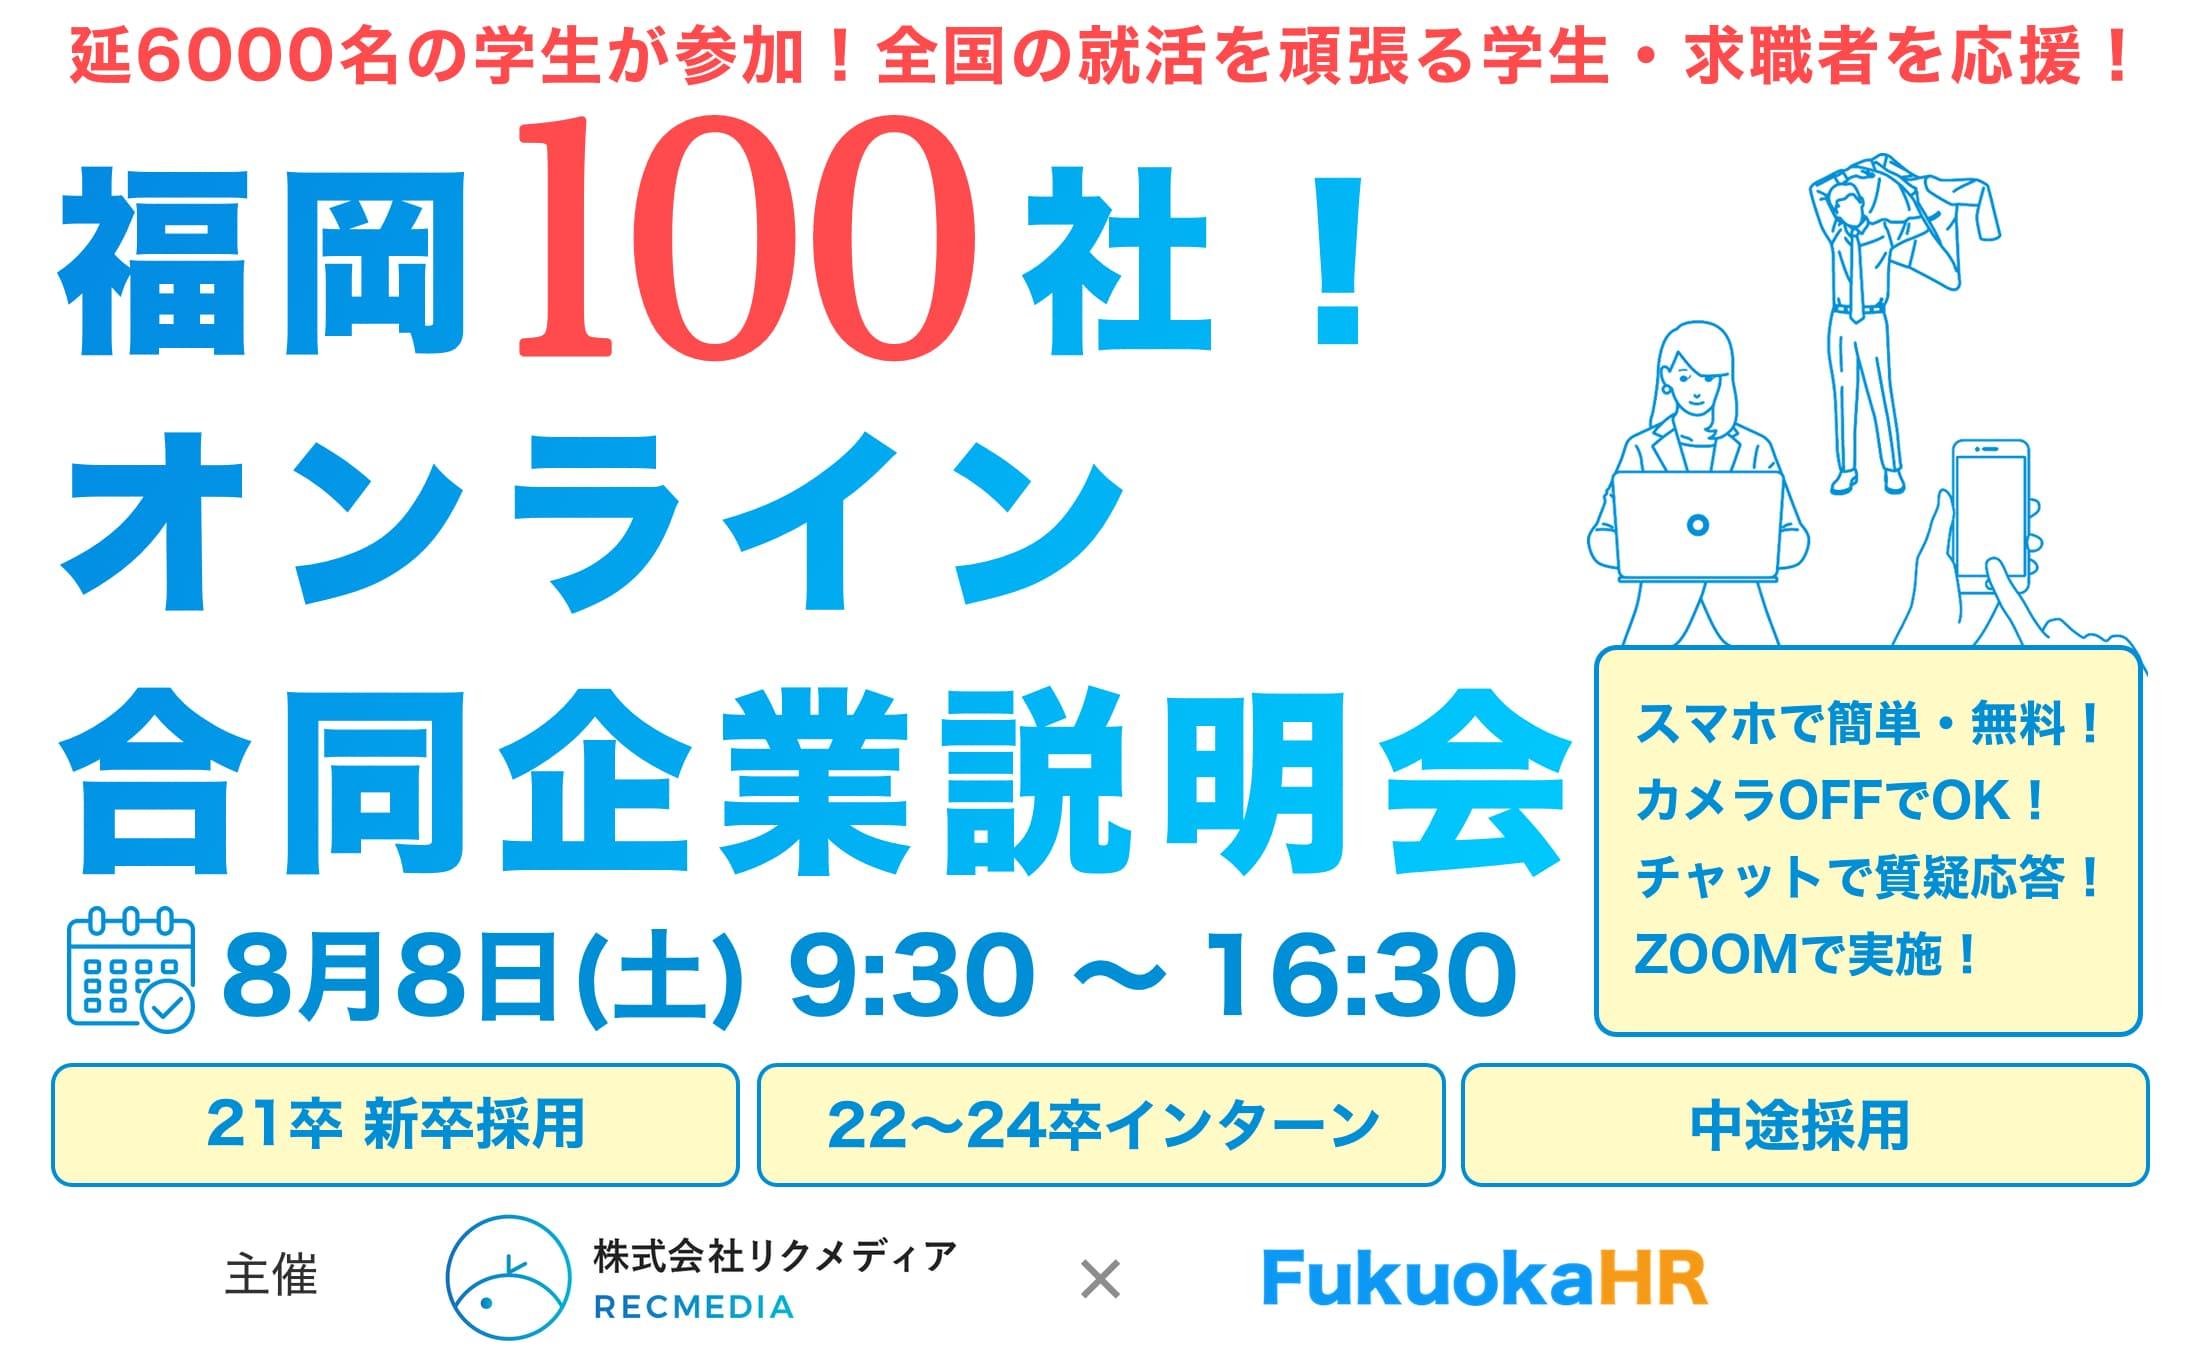 Fukuoka 100 top 11 min